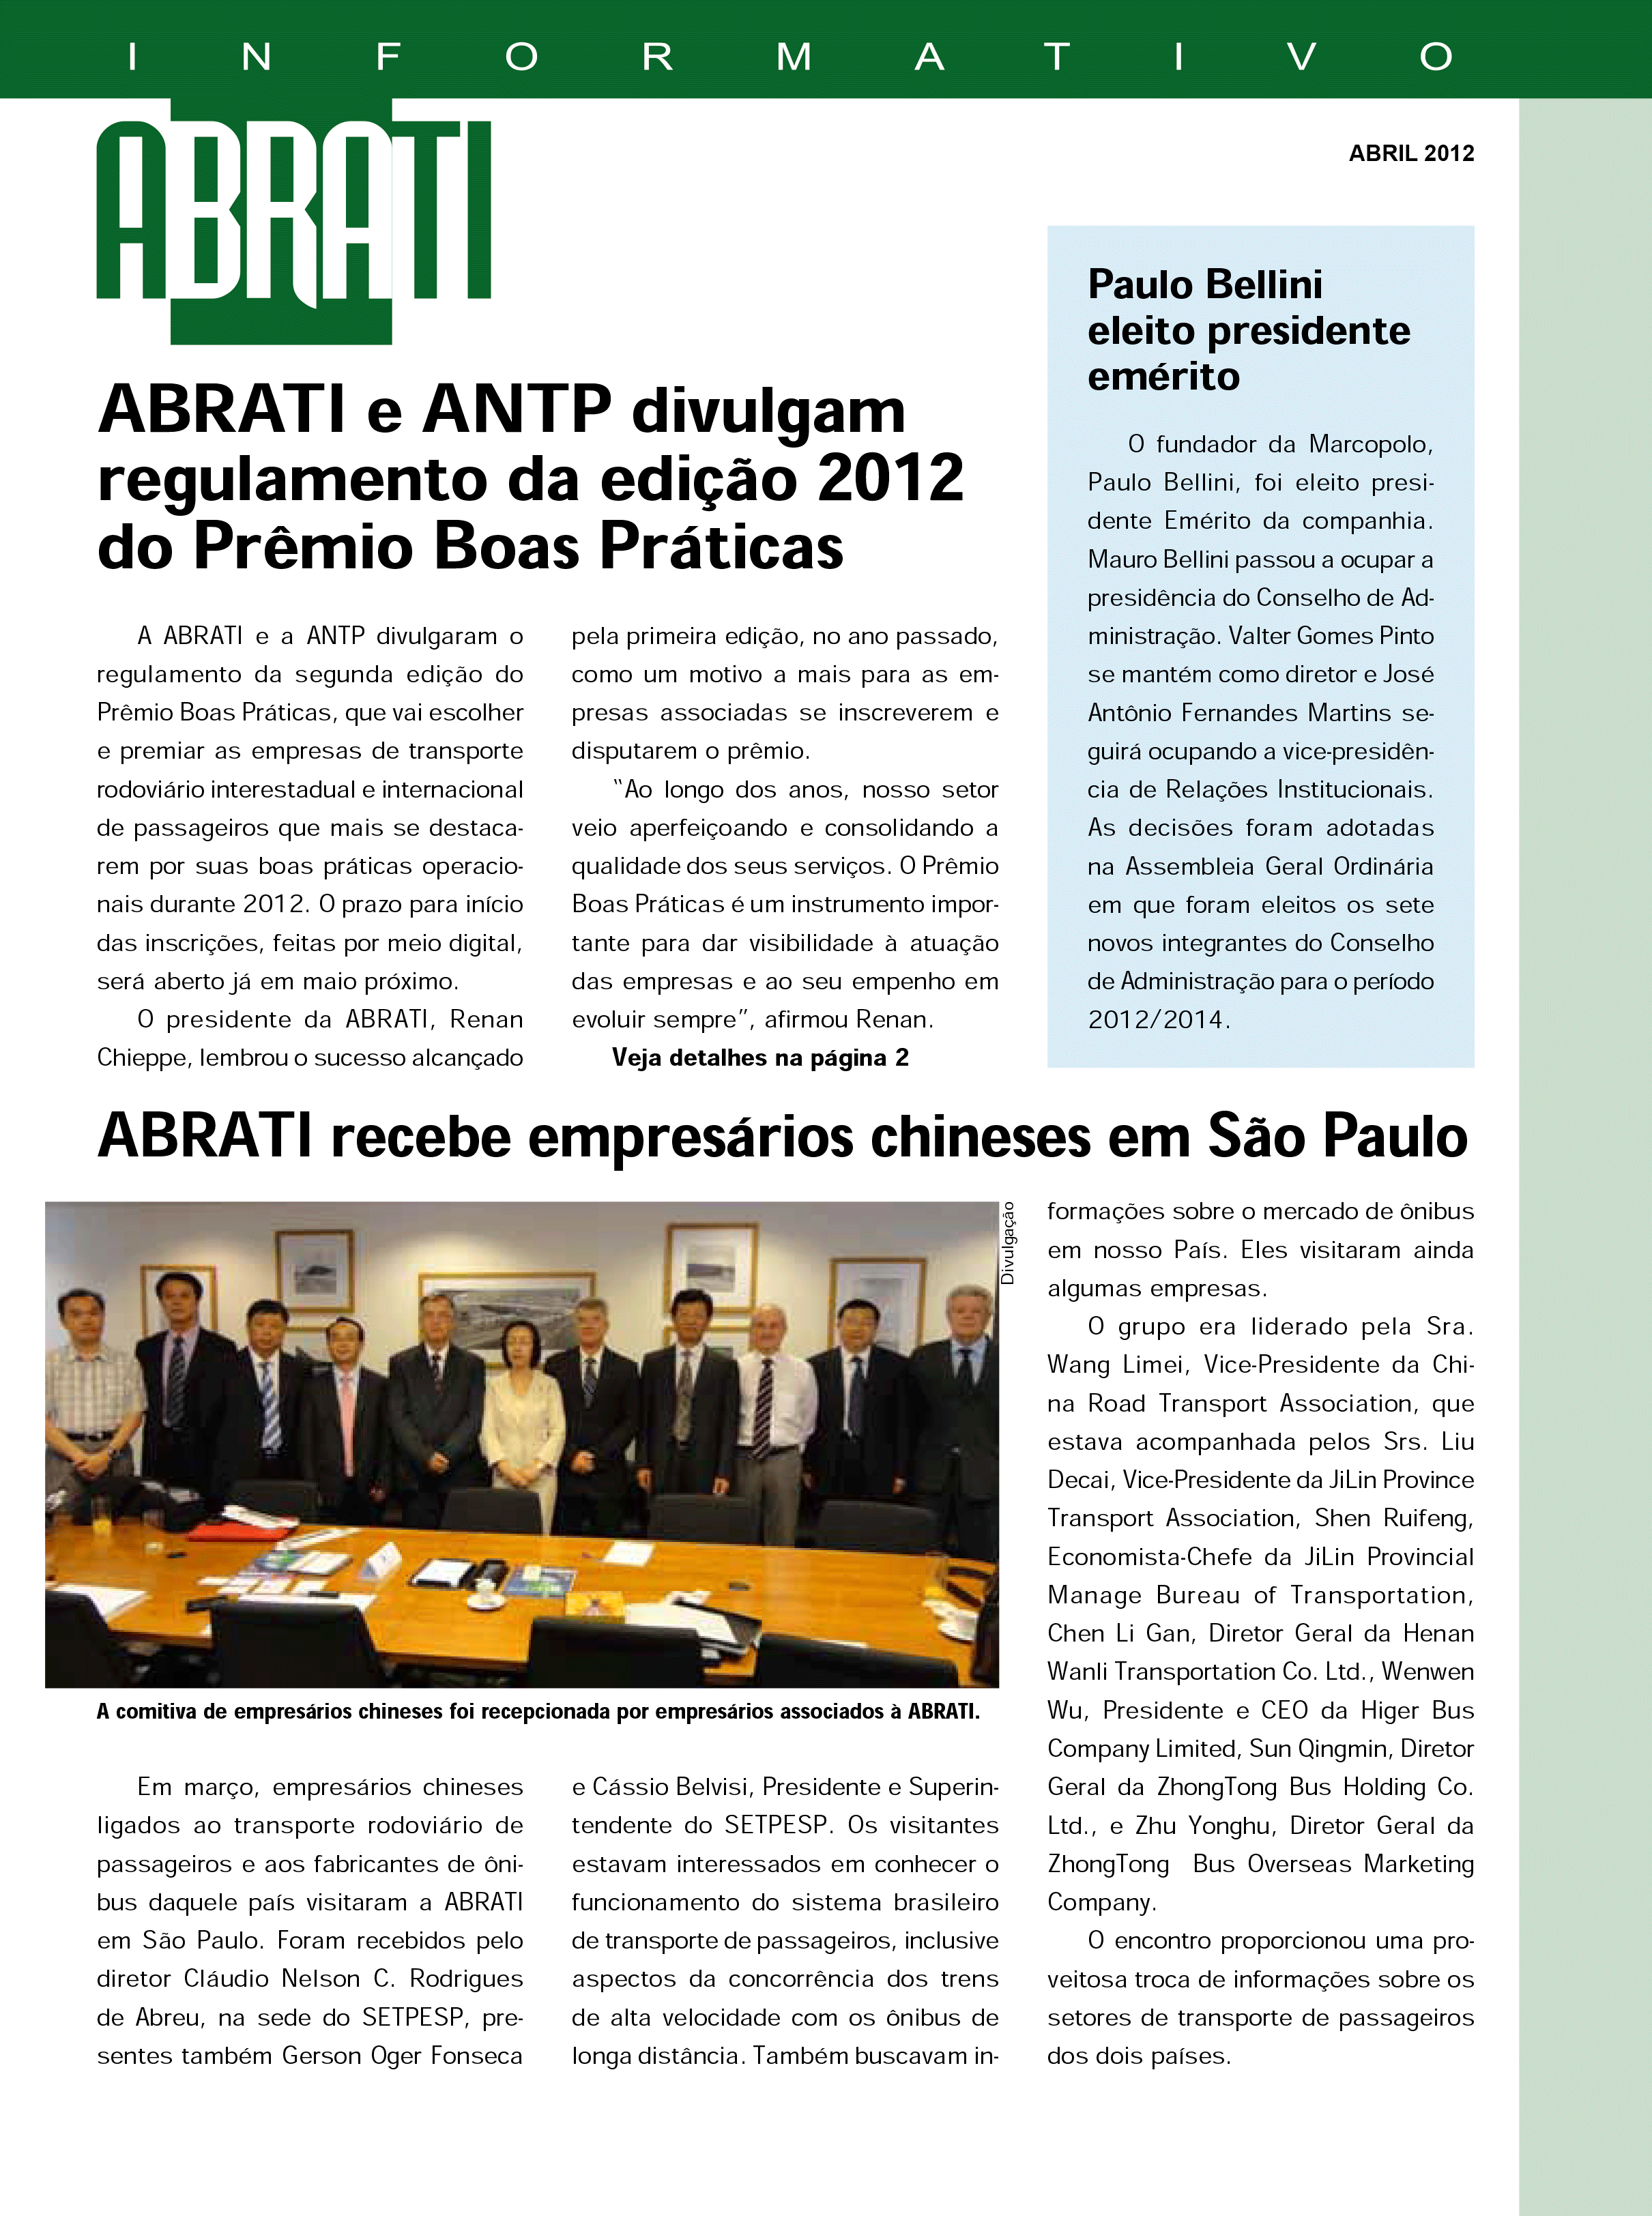 Informativo Abril 2012